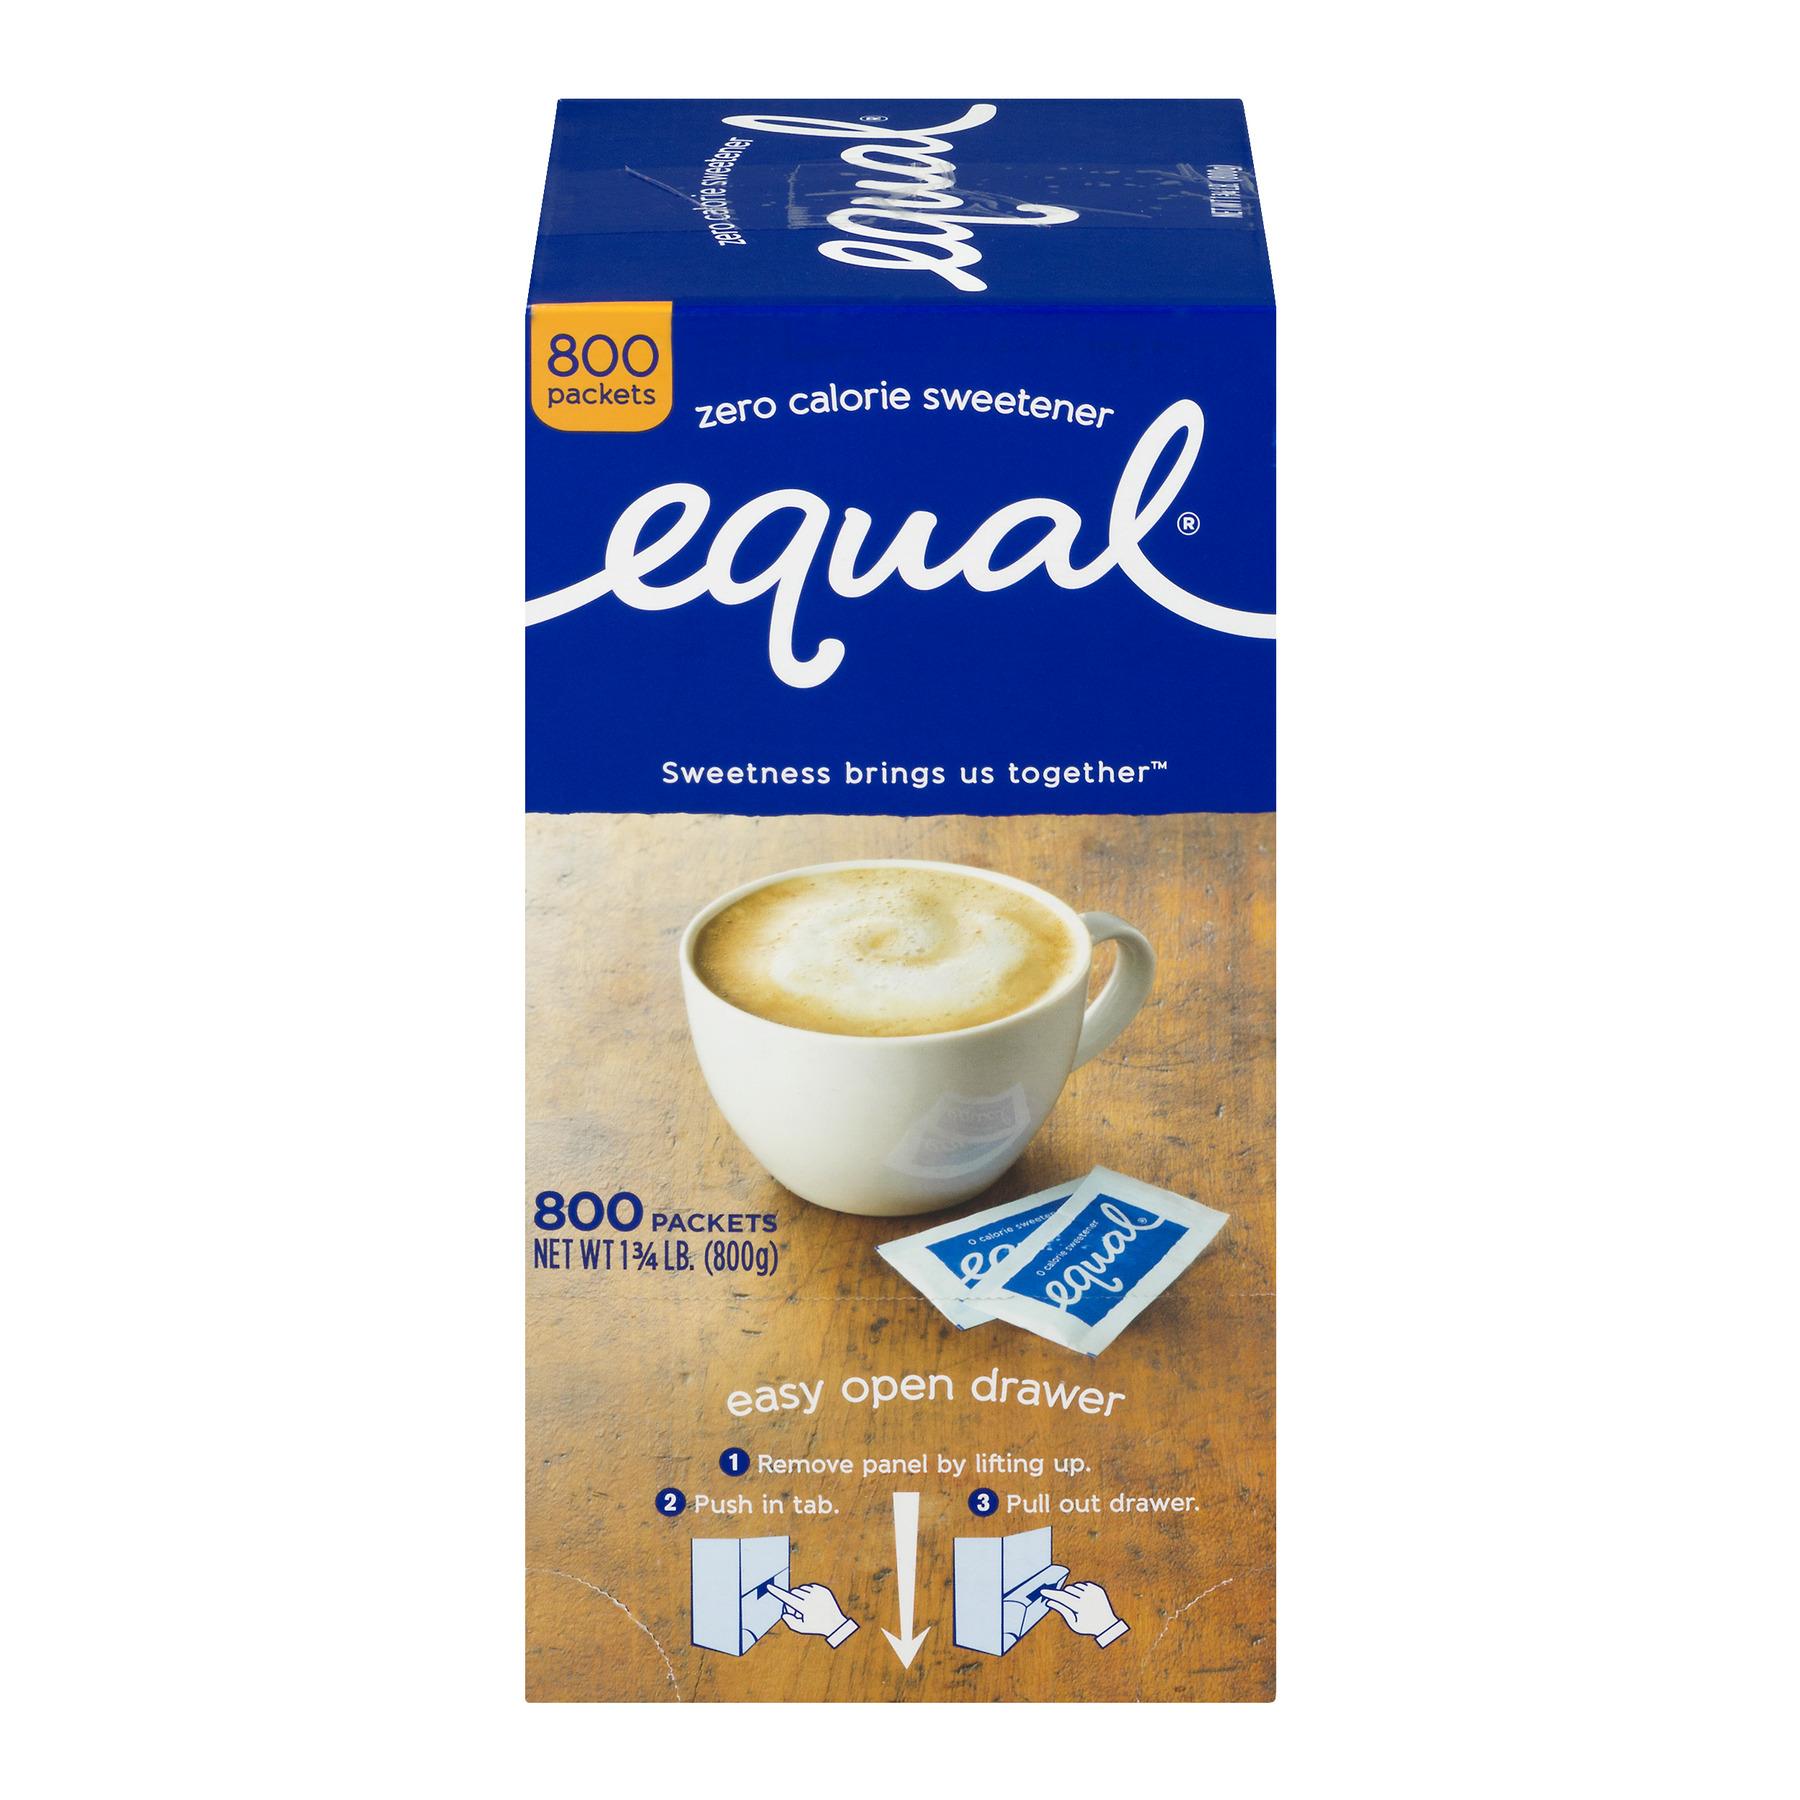 Equal Coffee and Tea Sweetener Sugar Free Sweetener with No Calories Artificial Sugar Replacement Sweetener, 800ct